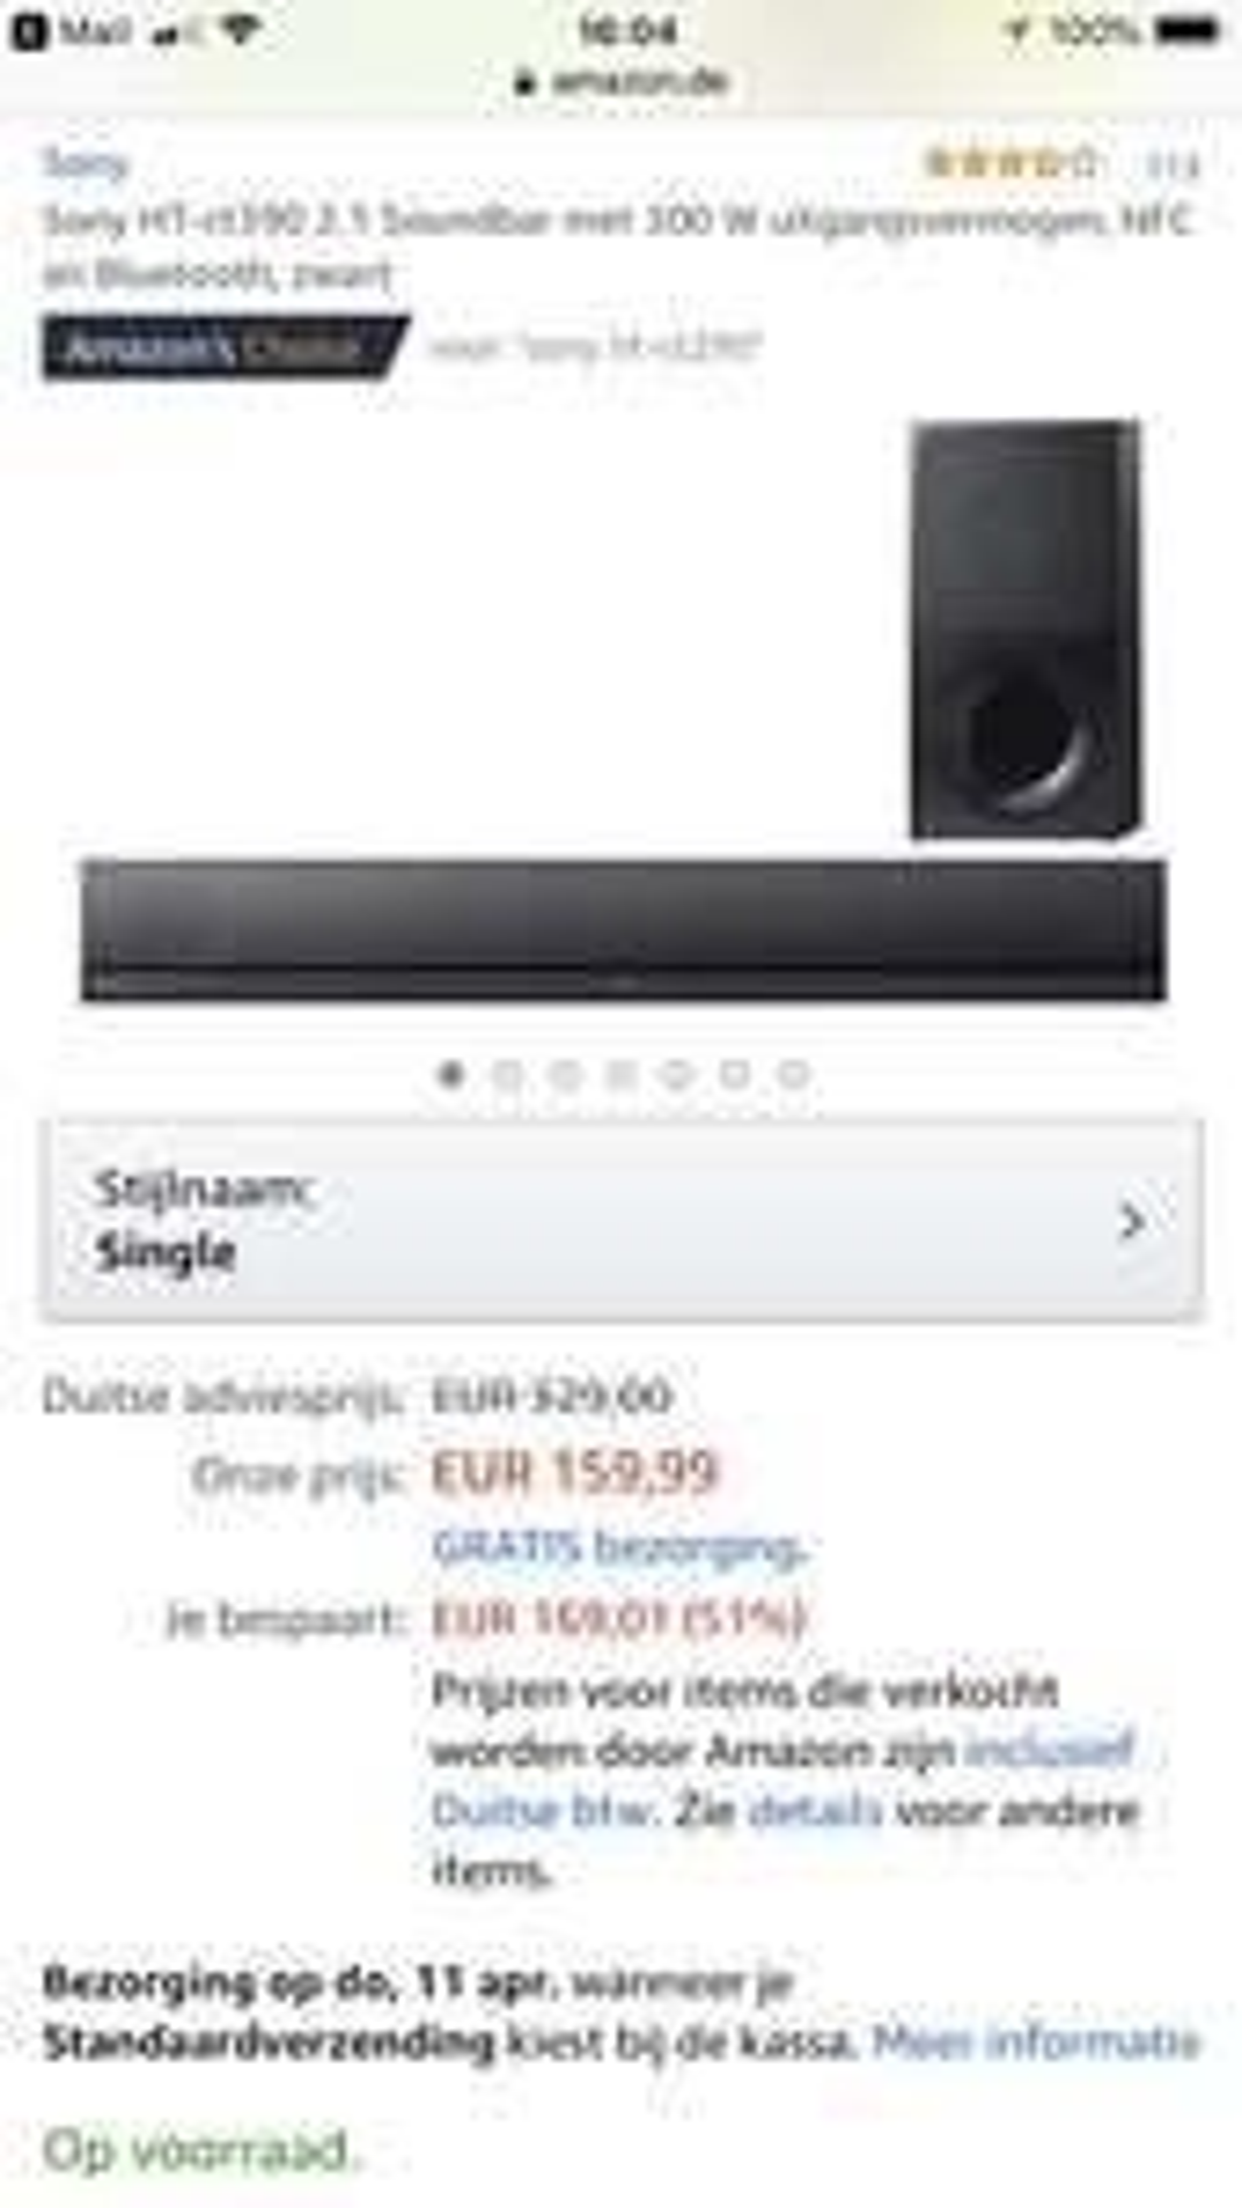 Amazon DE Soundbar Sony Gratis Verzending